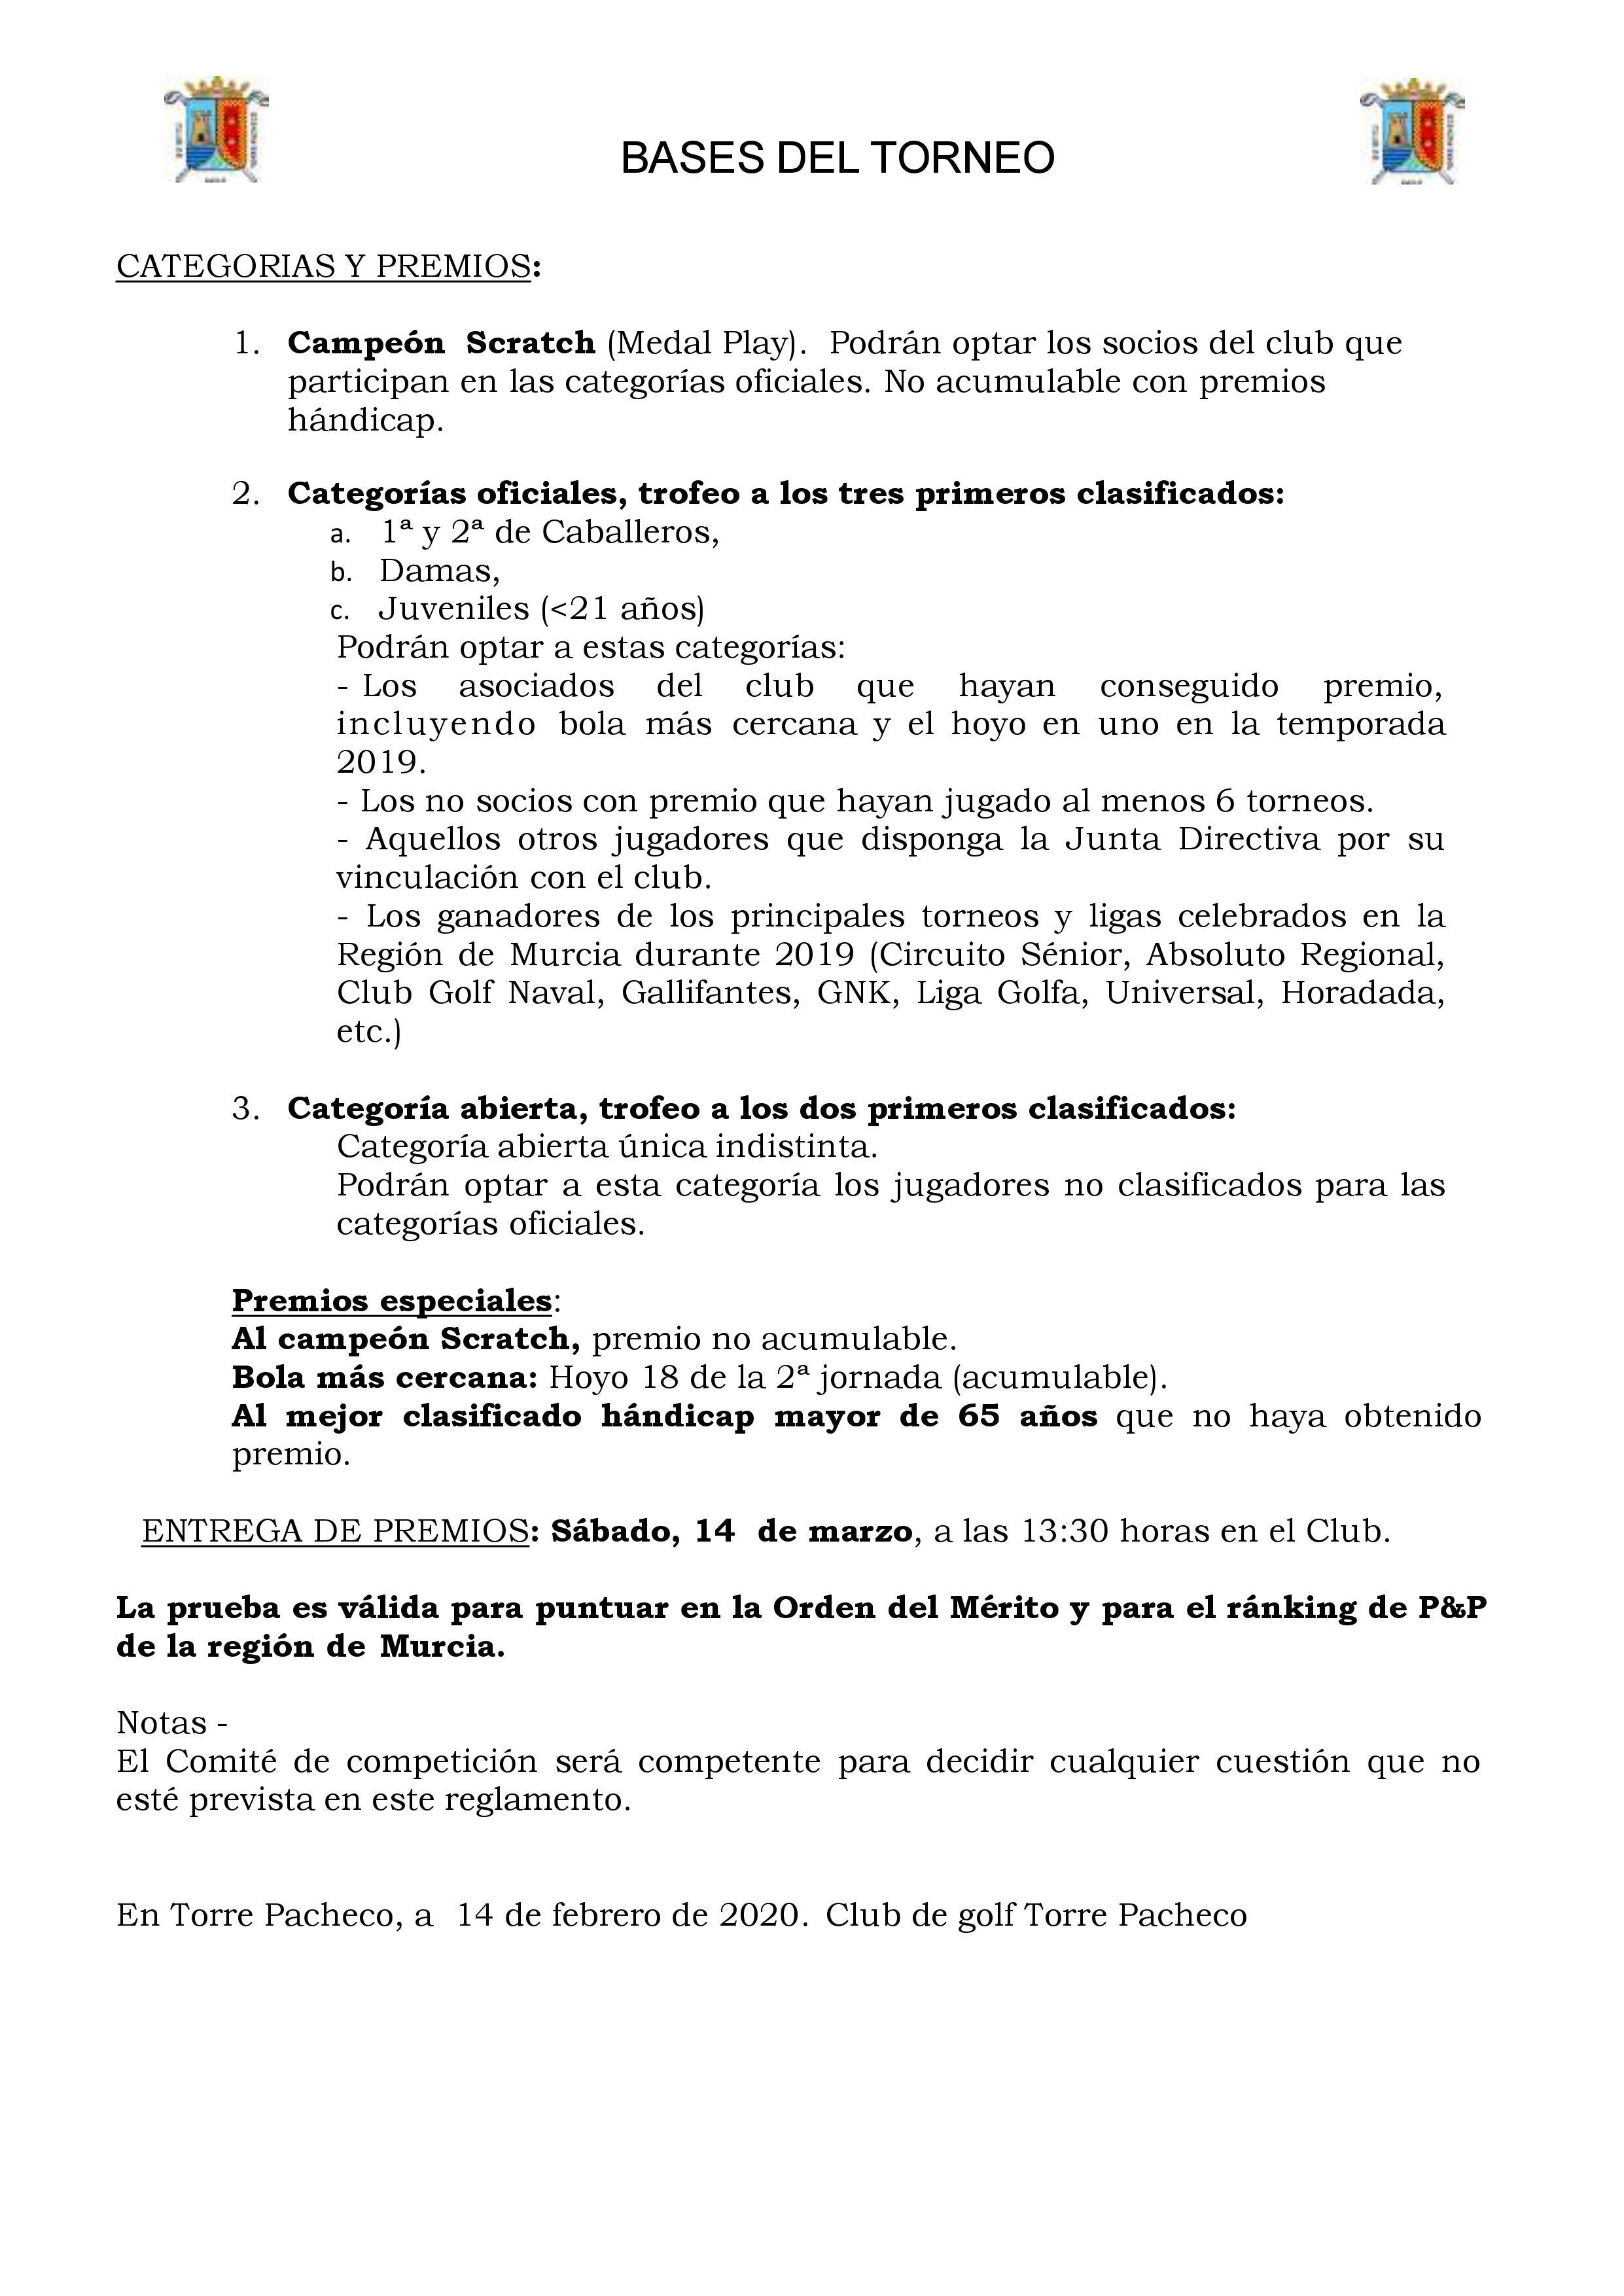 200314 TPA, Reglamento (2)